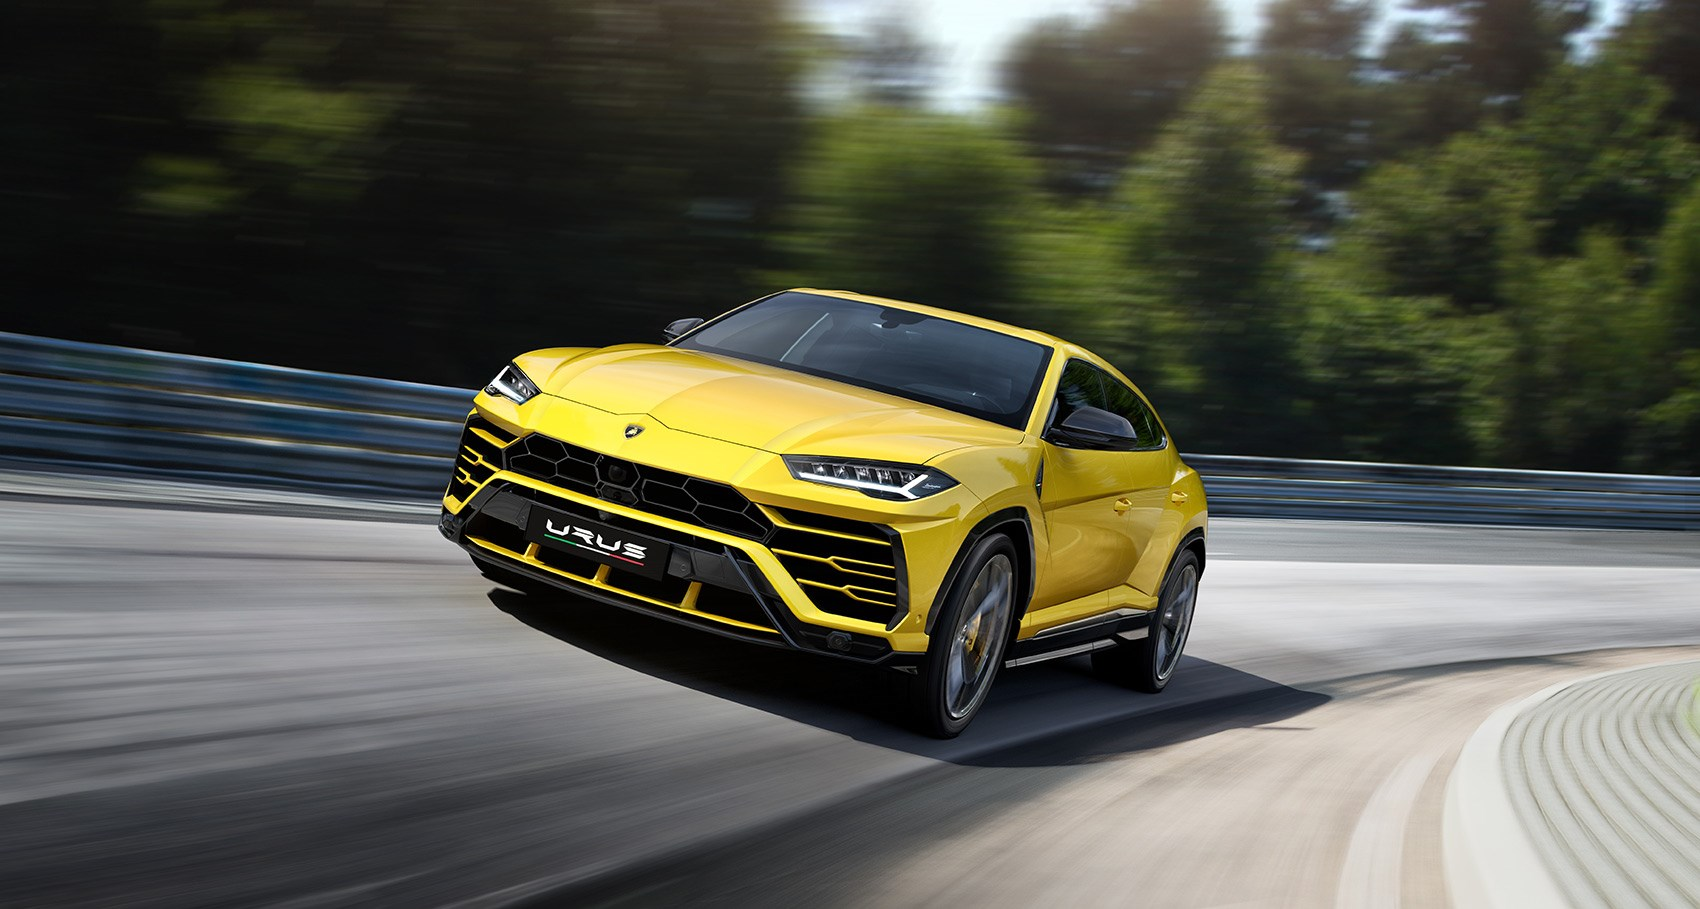 Lamborghini Urus to set Nurburgring lap record for SUVs by CAR Magazine